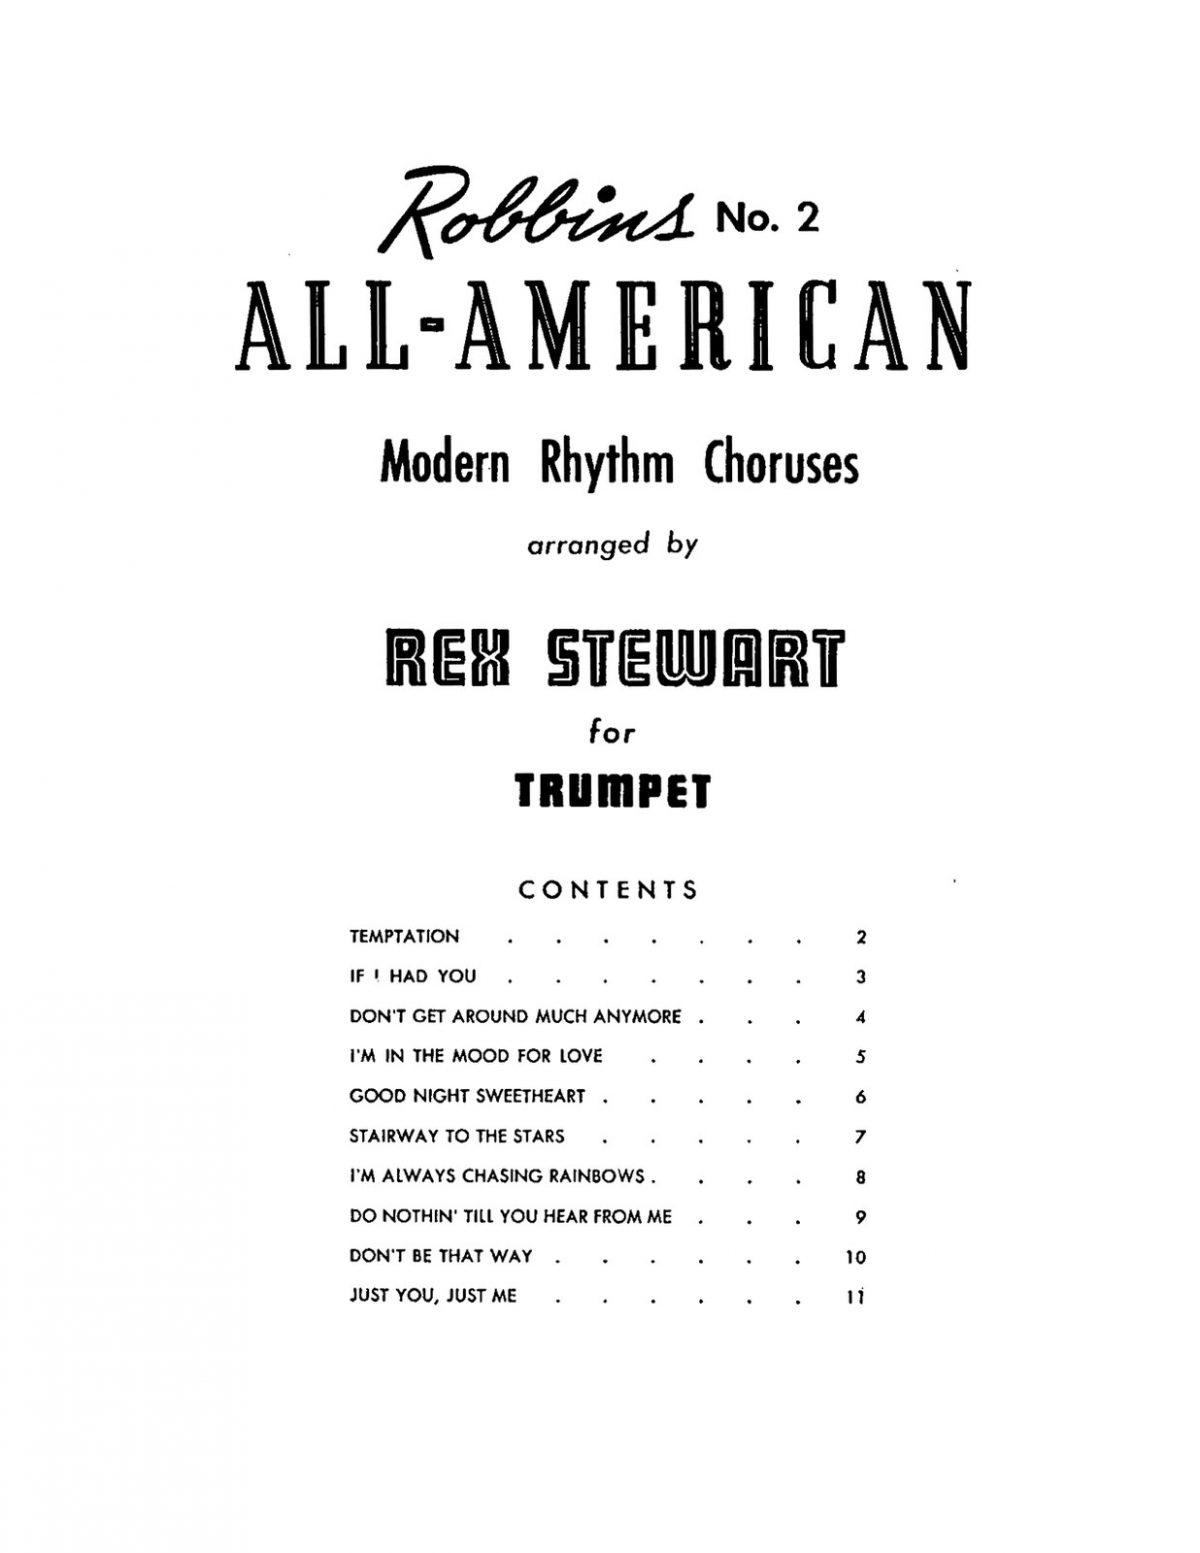 Stewart Rex, All American Modern Rhythm Choruses for Trumpet-p03